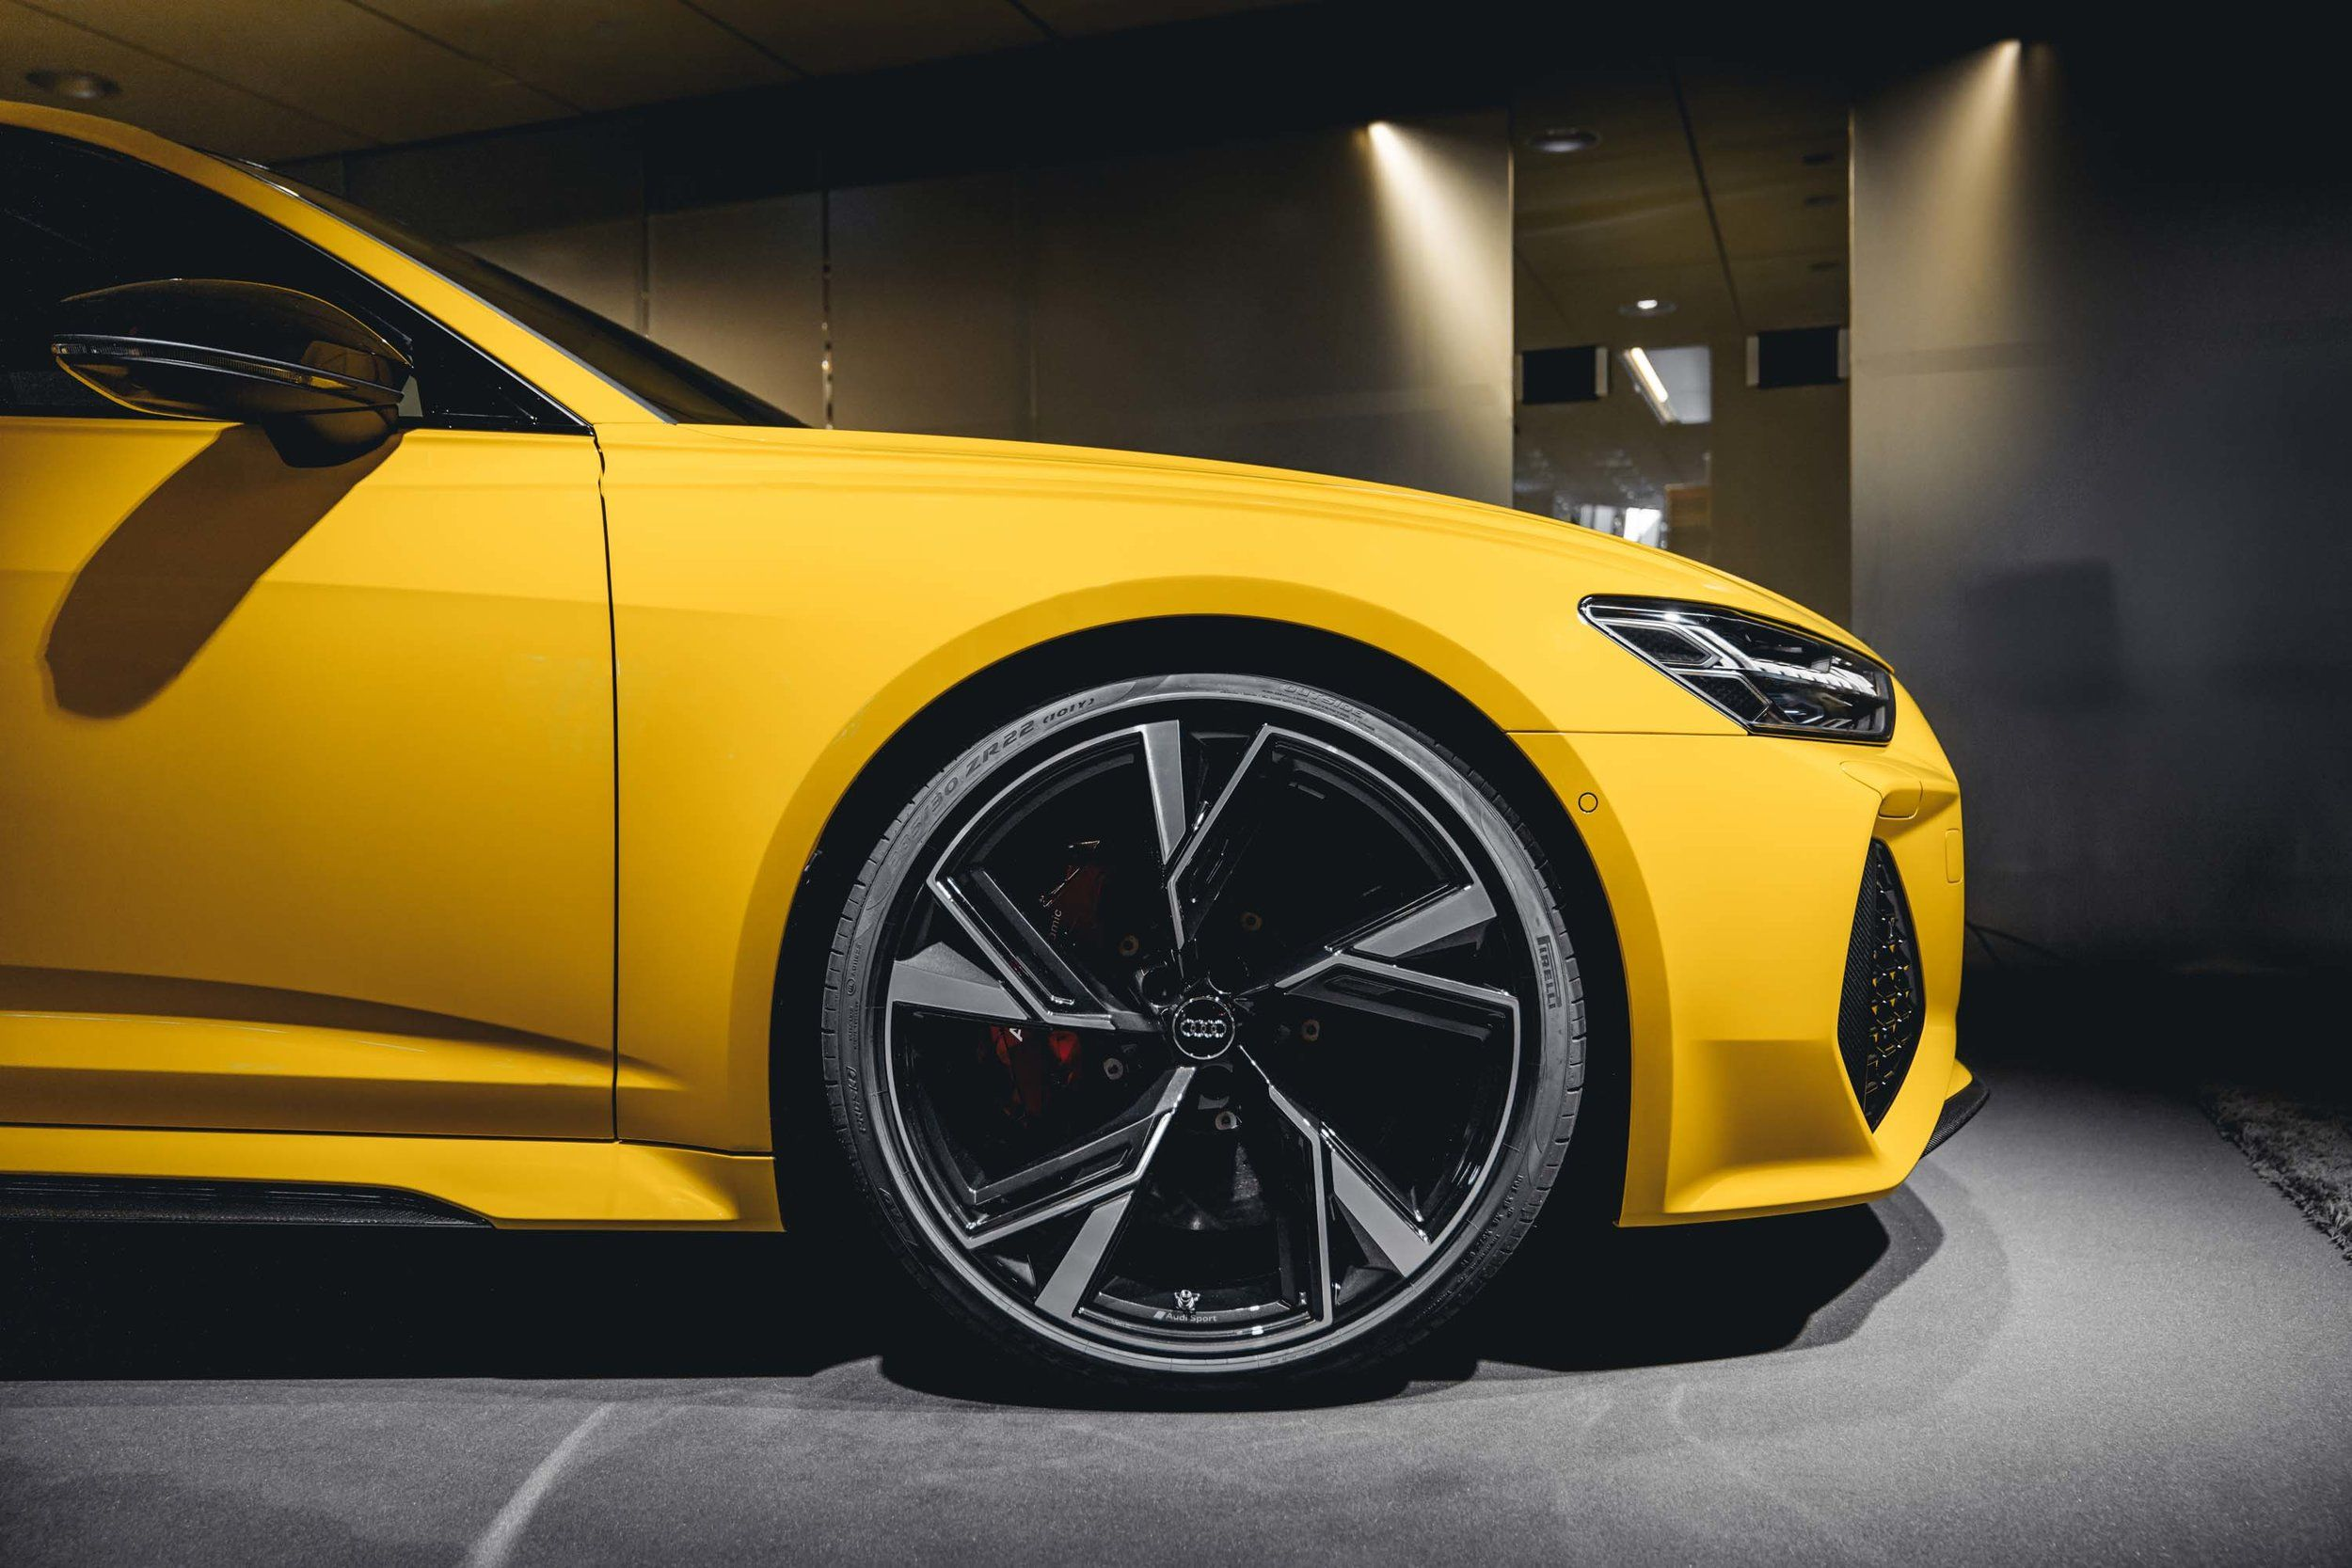 Audi Rs6 Avant C8 2020 Max Otto In 2020 Audi Rs6 Audi Audi Rs